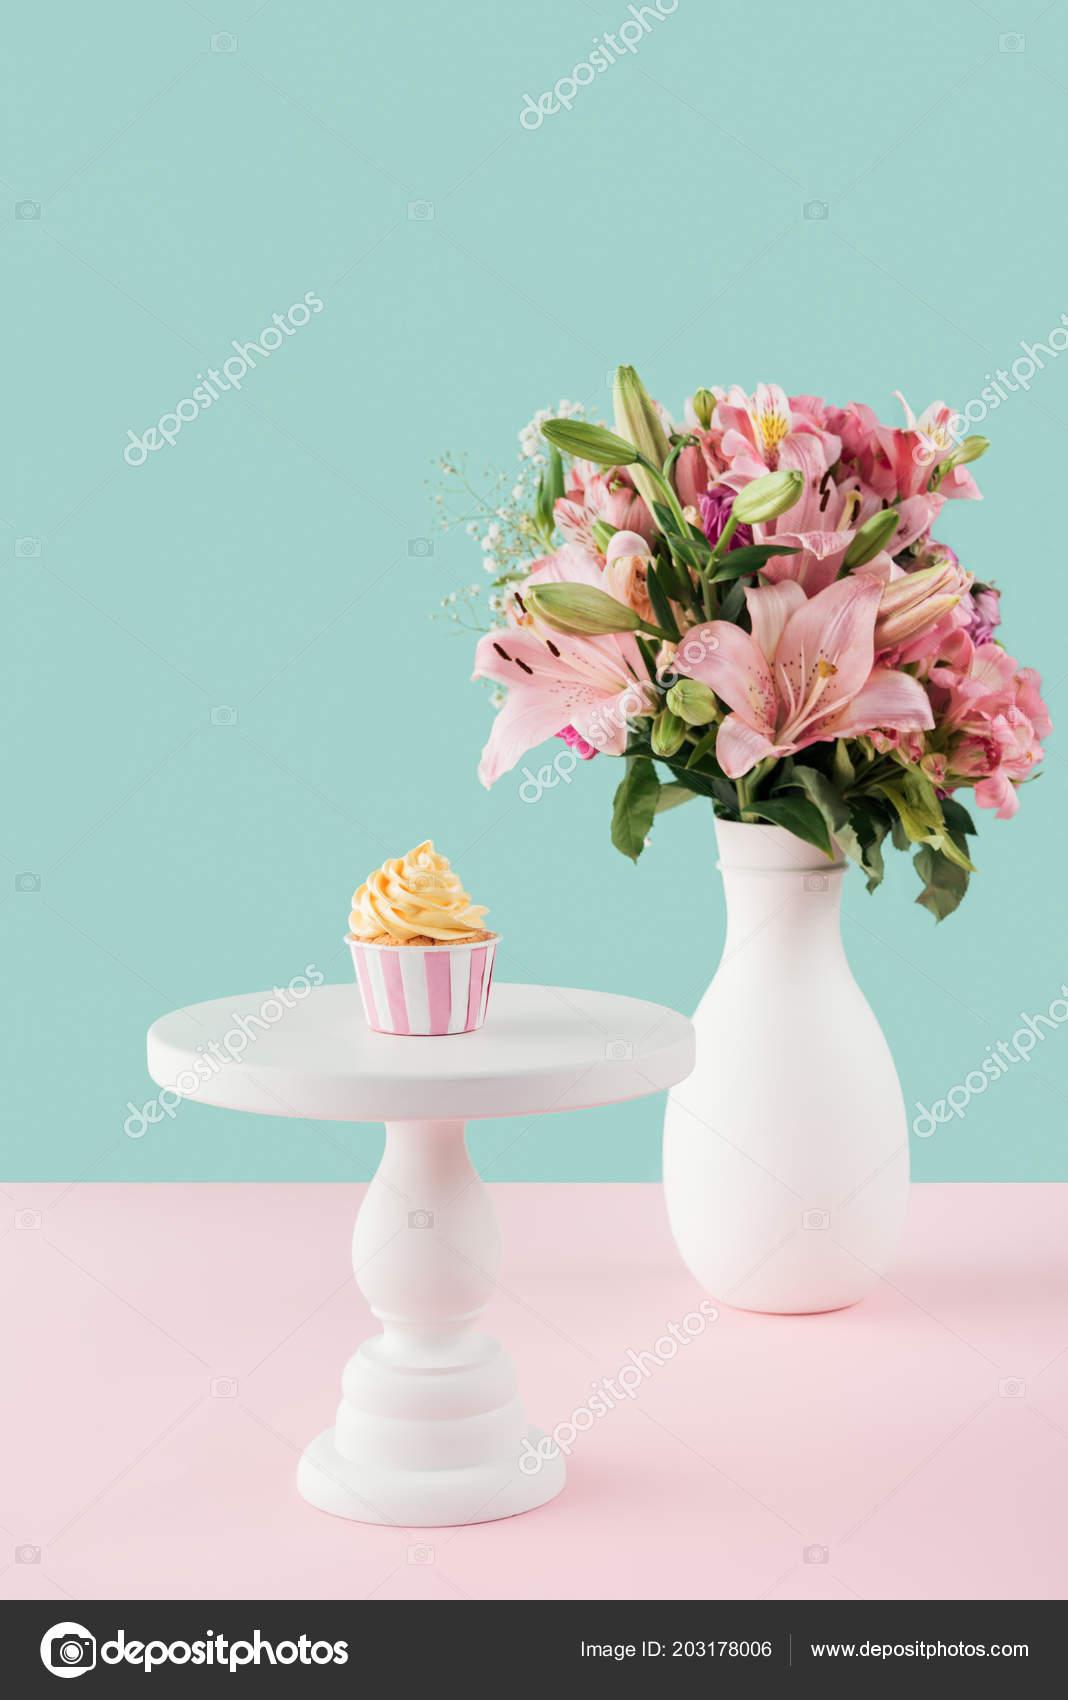 Depositphotos & One Cupcake Cake Stand Bouquet Lily Flowers Vase \u2014 Stock ...